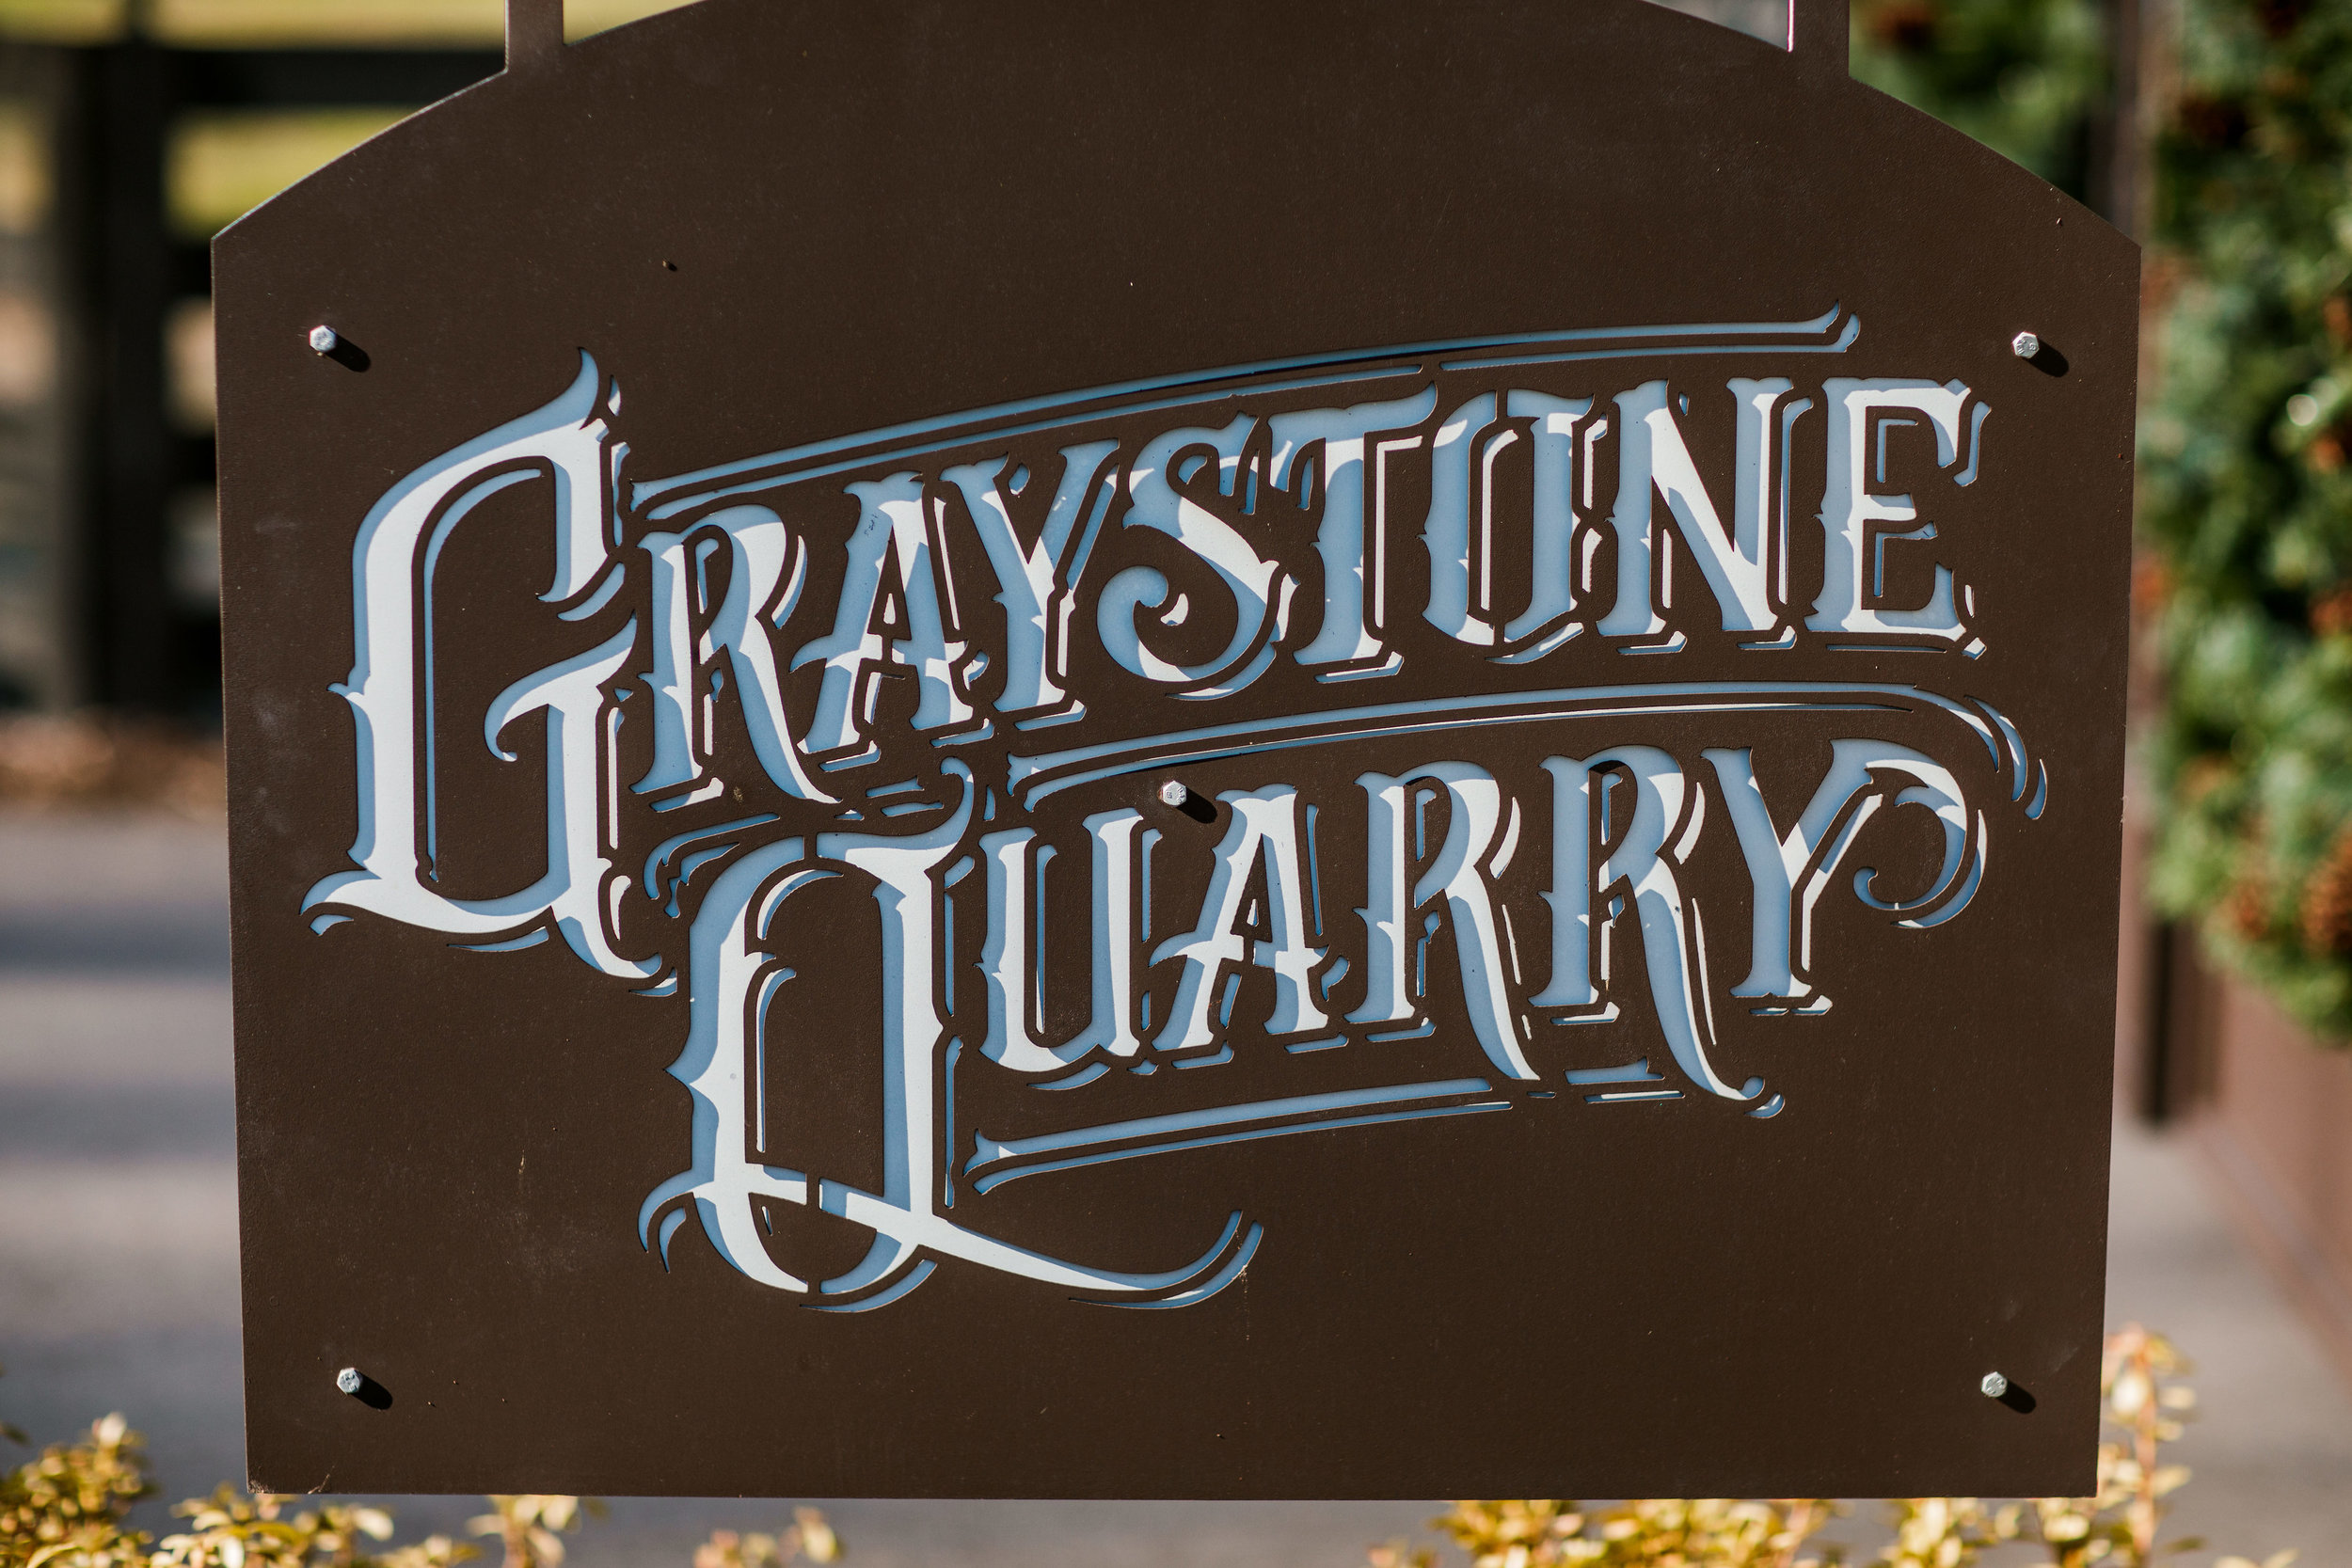 Graystone-Quarry-Wedding 7.jpg